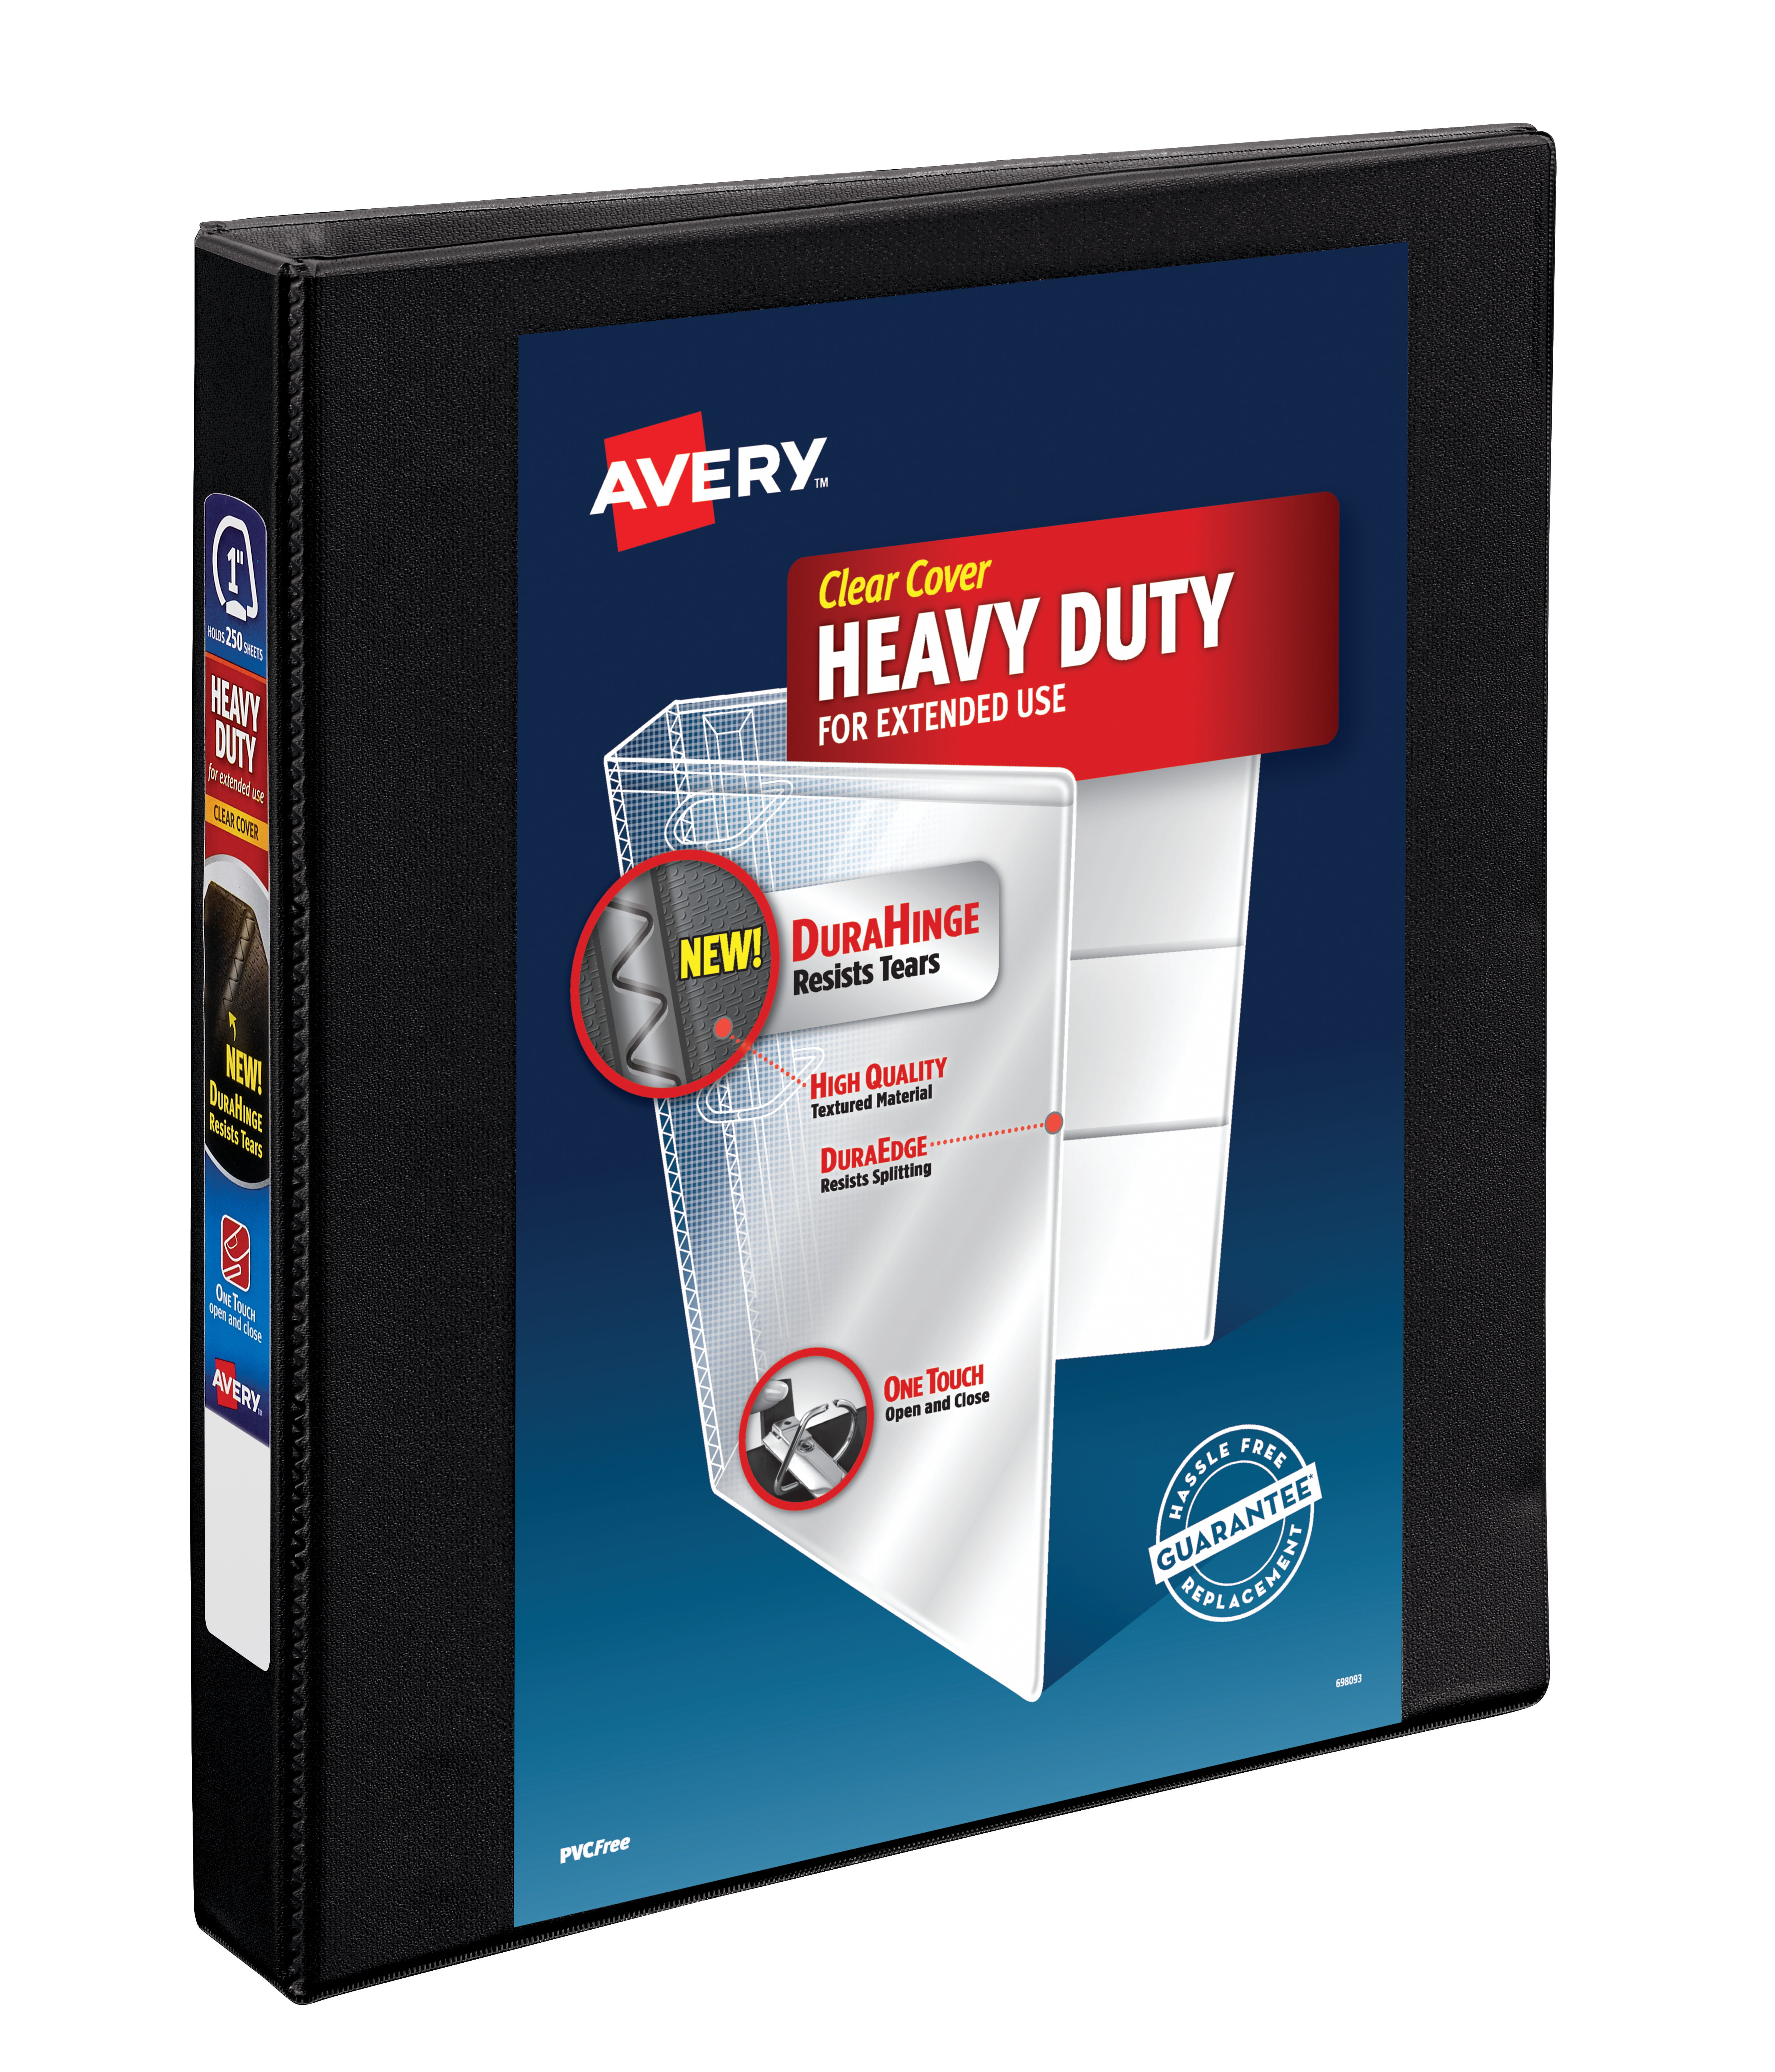 "Avery 1"" Heavy Duty Binder, One Touch EZD Ring, Black, 275"